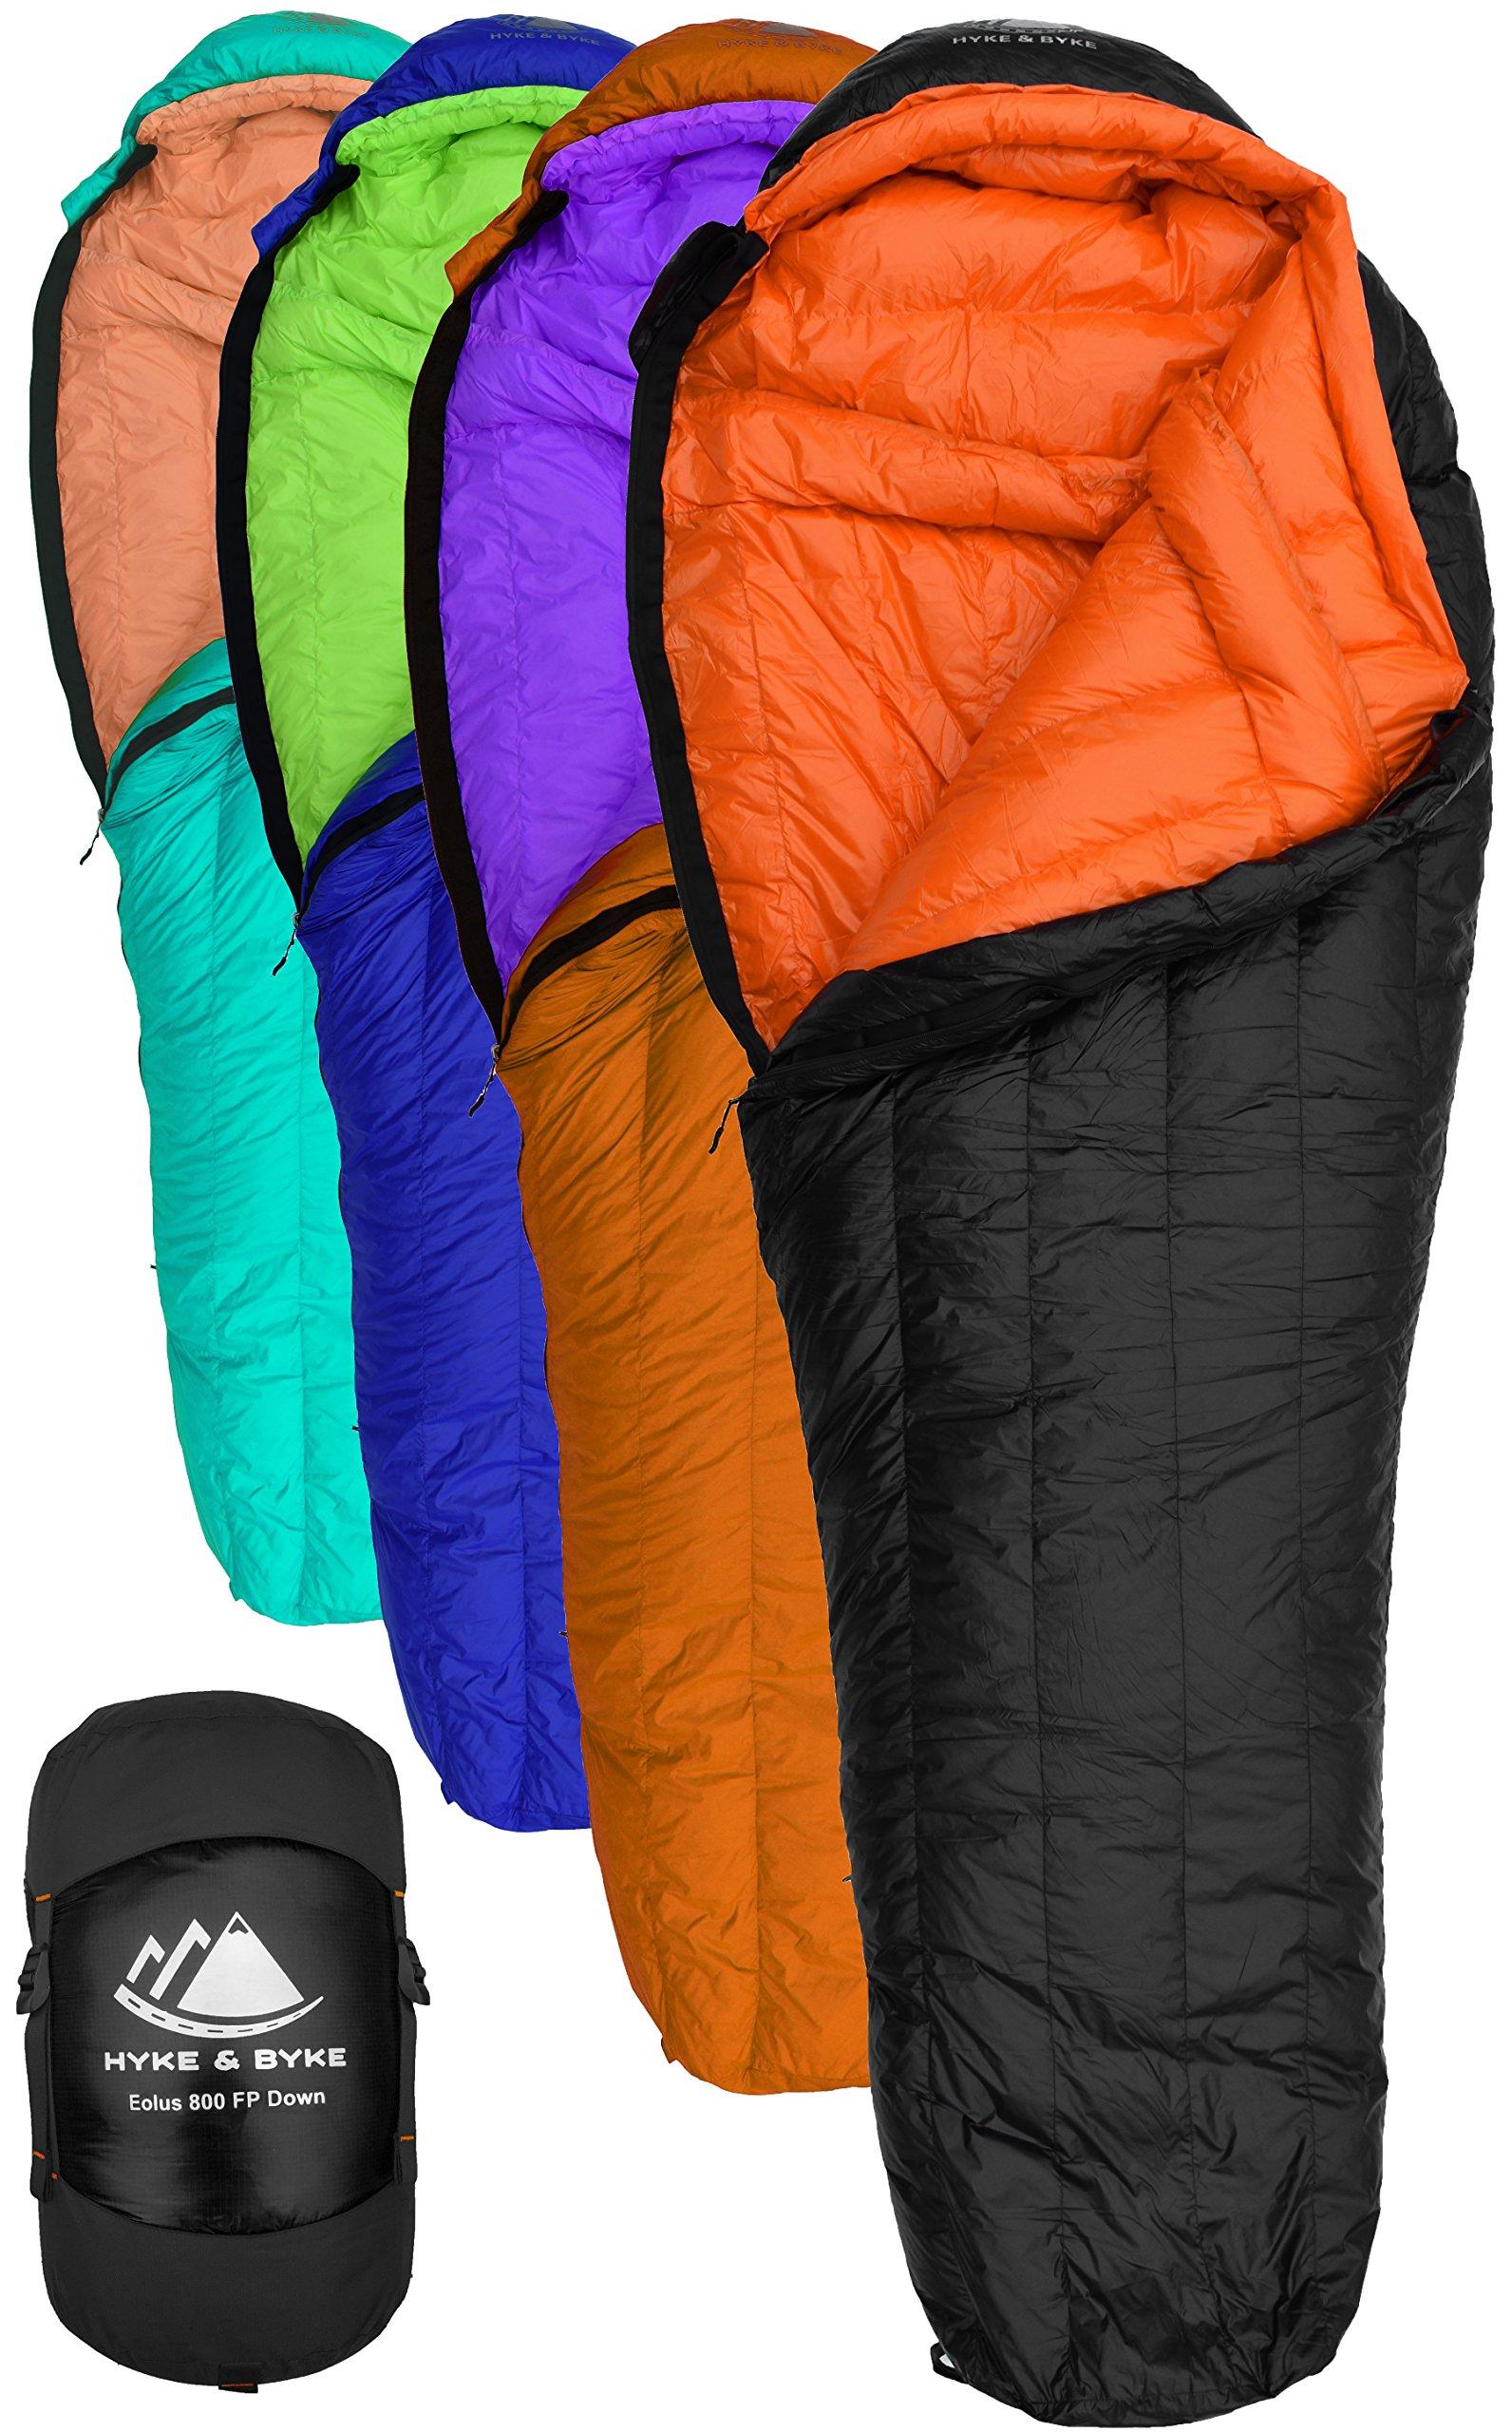 Hyke & Byke Eolus 15 & 30 Degree F 800 Fill Power Hydrophobic Goose Down Sleeping Bag with LofTech Base - Ultra Lightweight 3 Season Men's and Women's Mummy Bag Designed for Backpacking